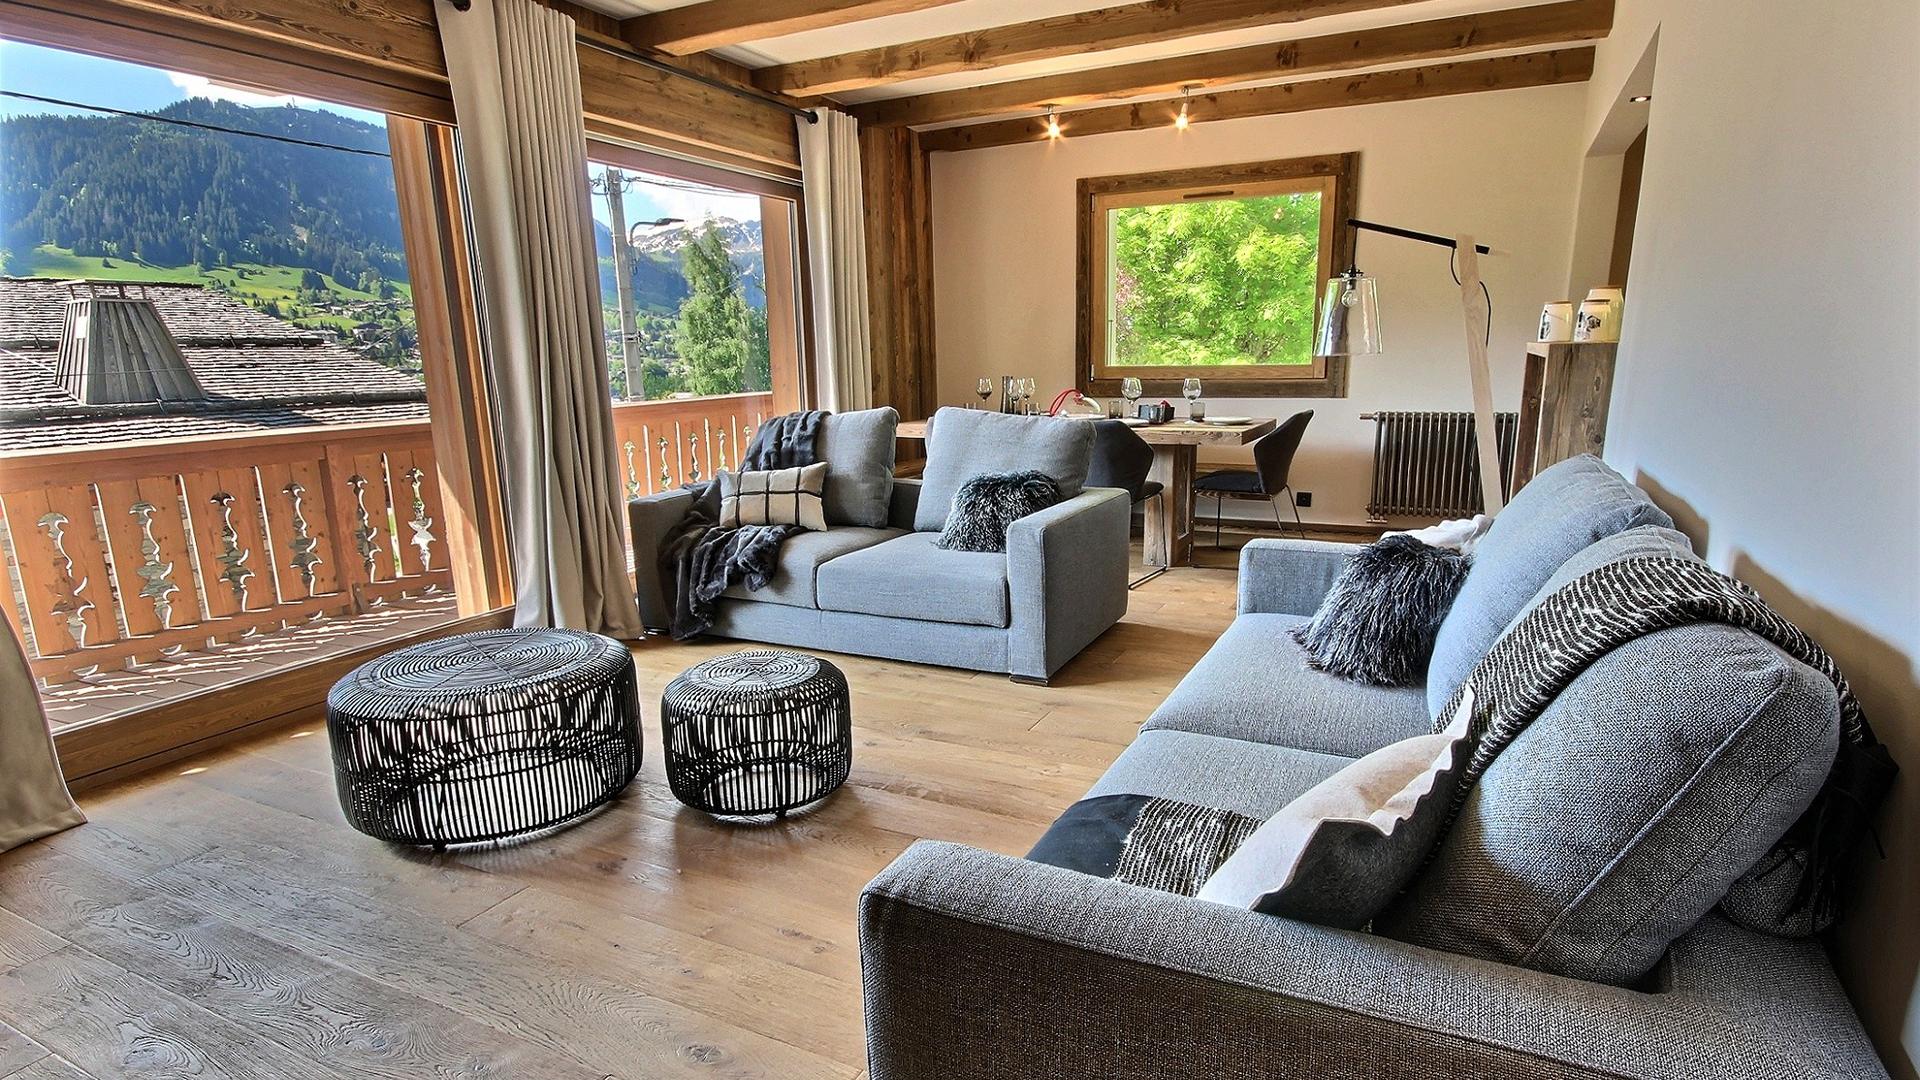 Jaillet Apartment Apartments, France